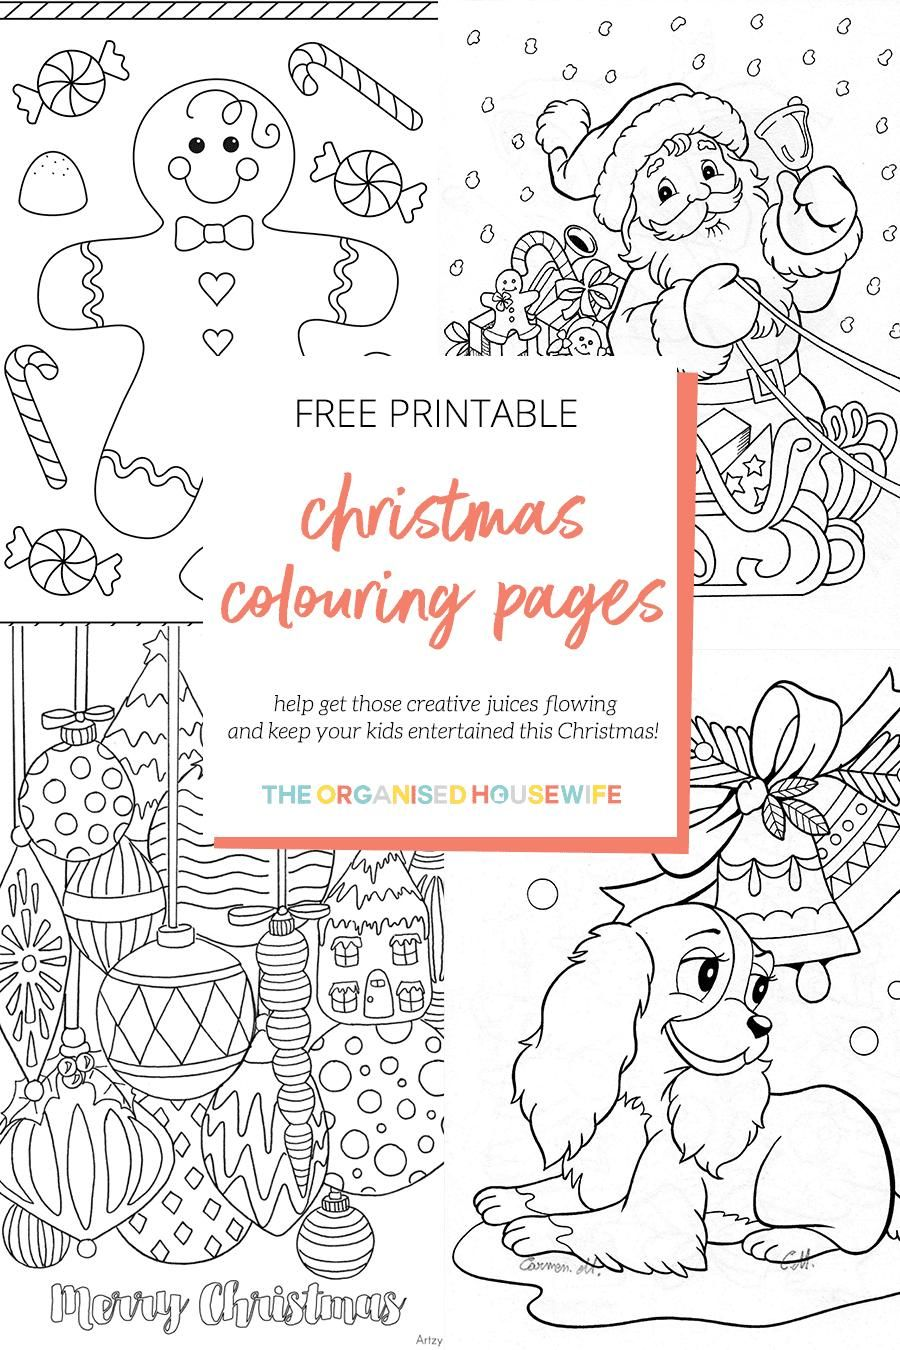 42 Free Printable Xmas Colouring Christmas Coloring Pages Printable Christmas Coloring Pages Christmas Coloring Printables